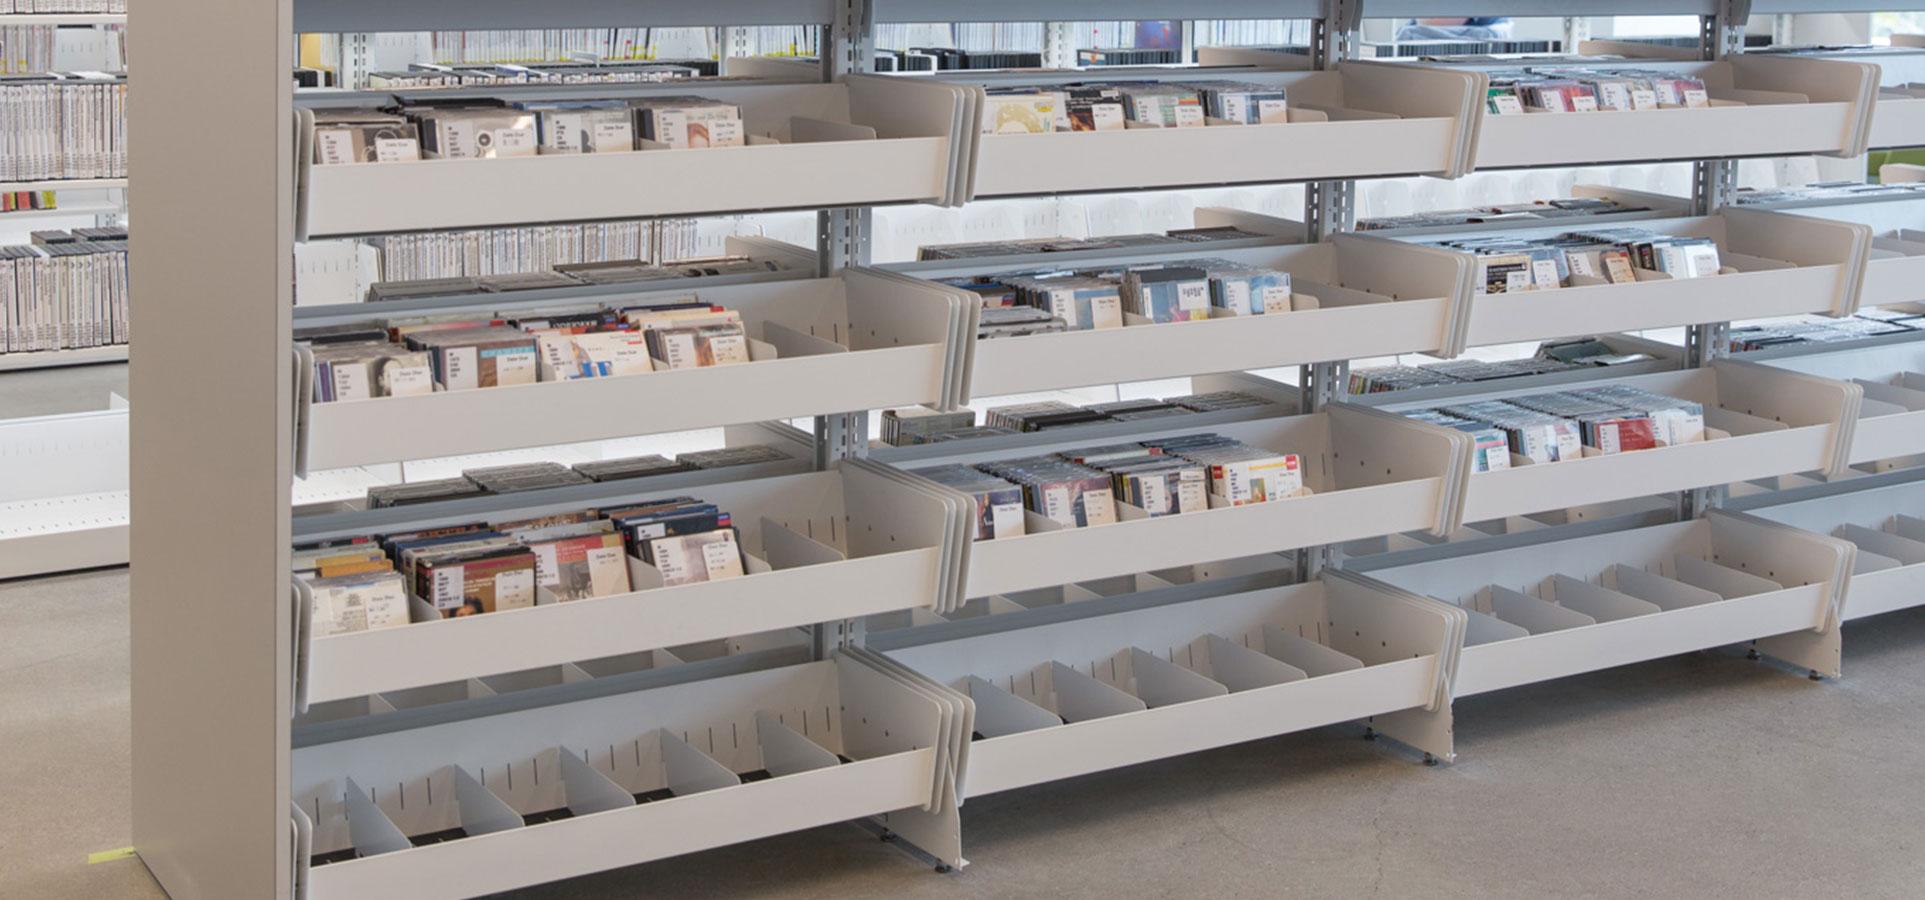 library browsing bins